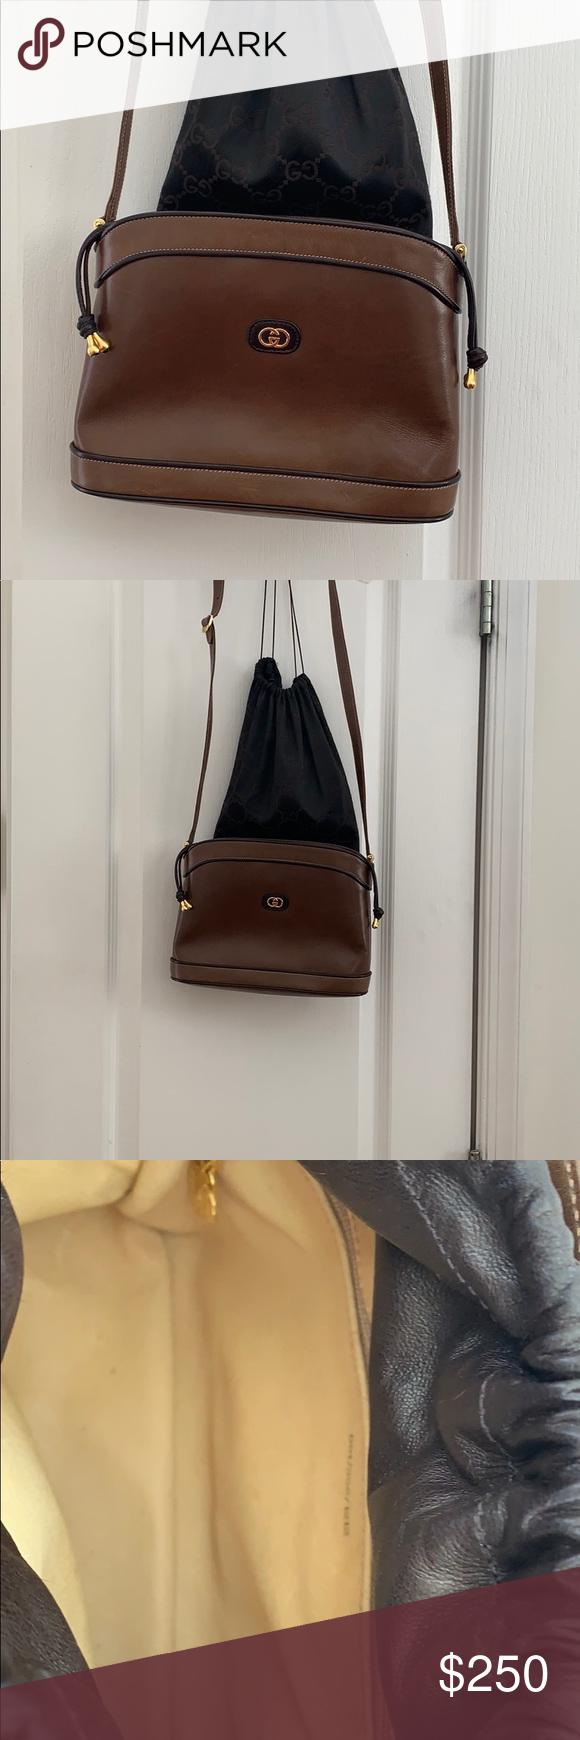 Gucci Handbag with original dust bag Beautiful Gucci over shoulder bag Minimal Gucci Handbag with original dust bag Beautiful Gucci over shoulder bag Minimal use Great co...